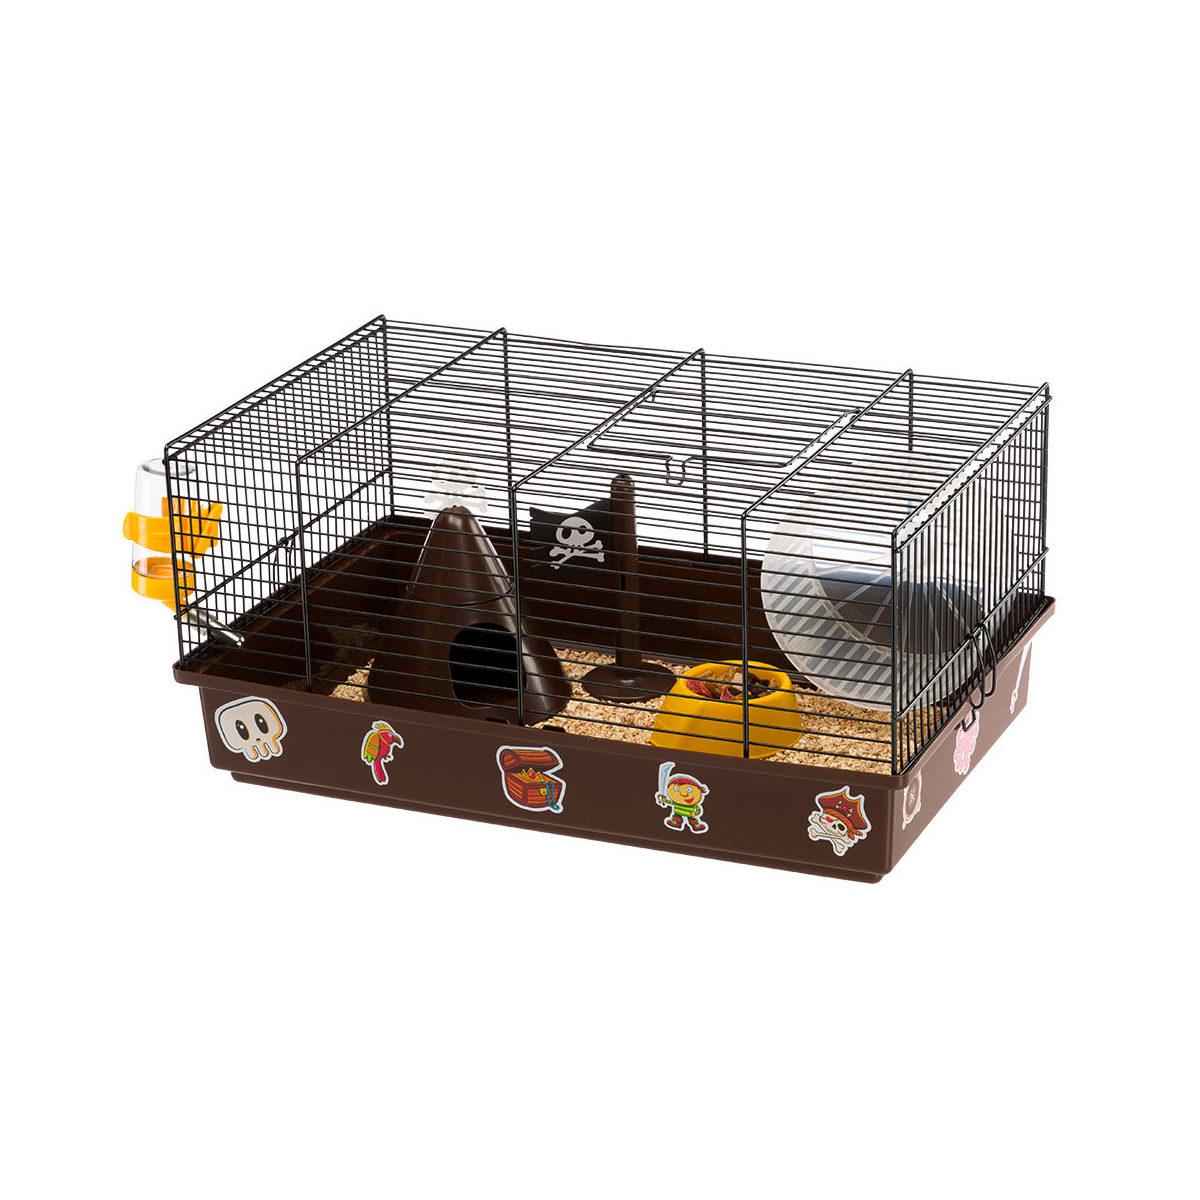 Ferplast Criceti 9 Hamsterkooi 46x29,5x23cm Pirates